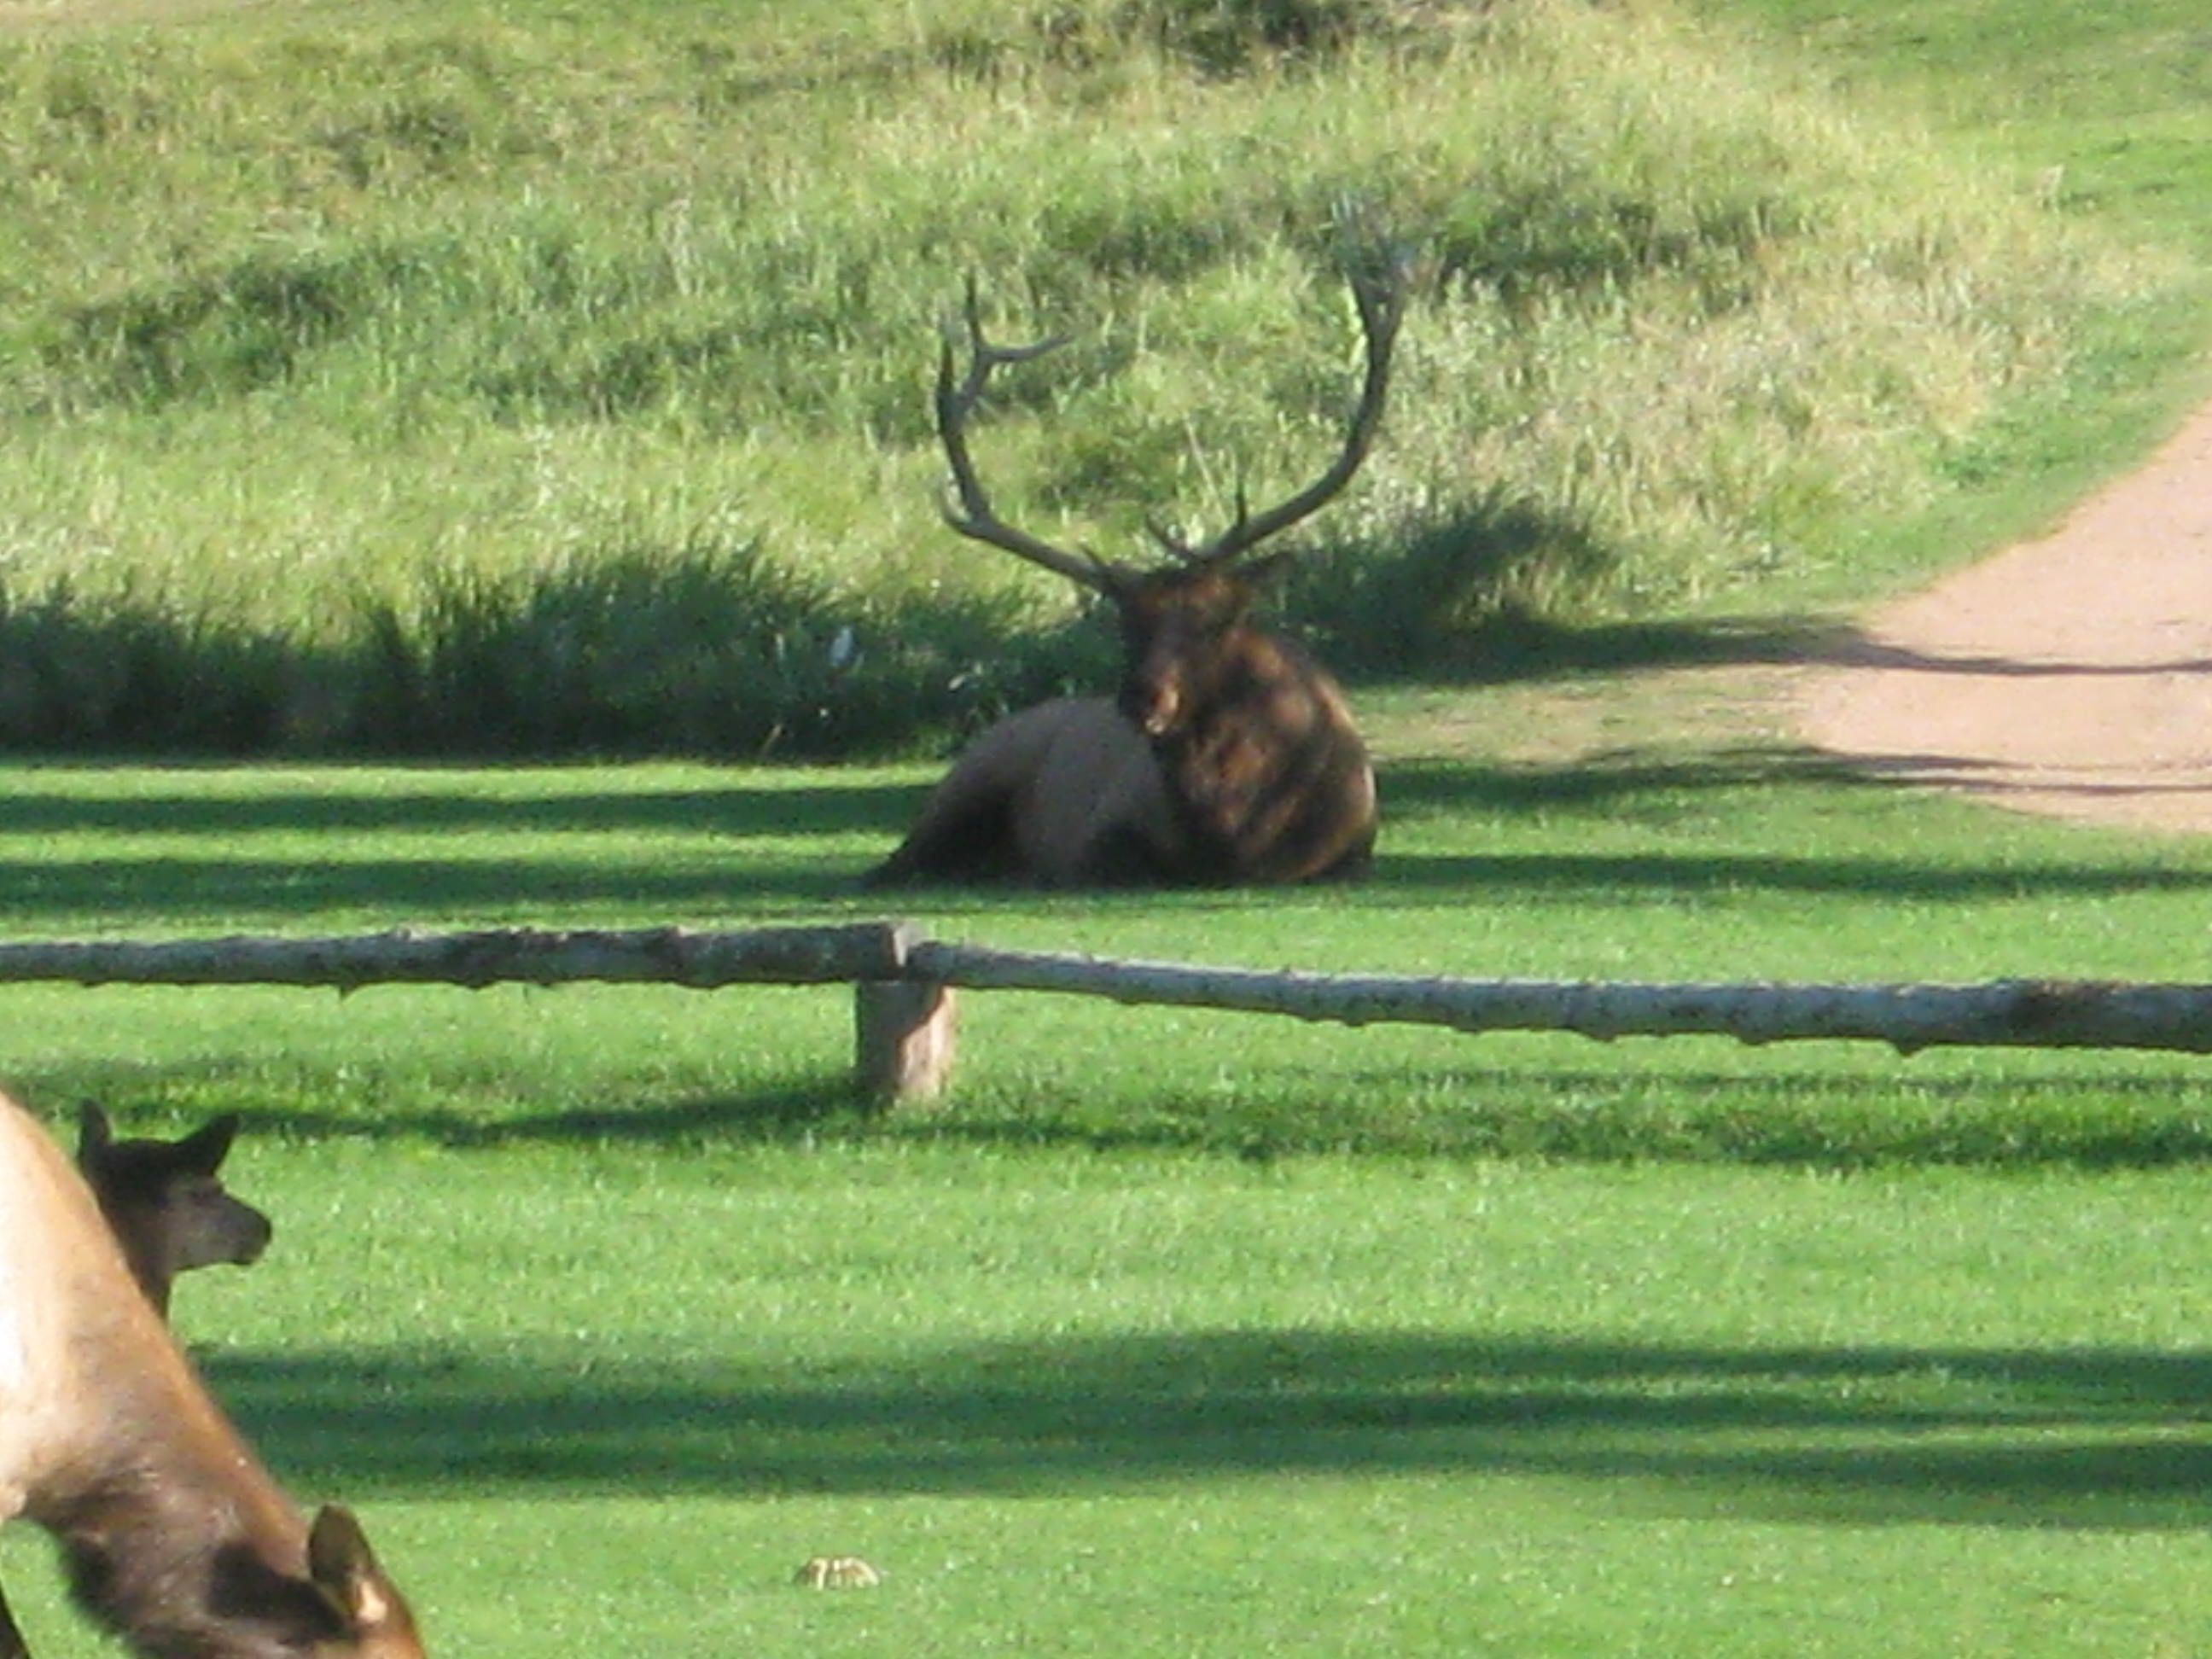 Wild elk on the golf course! Evergreen, Colorado Golf